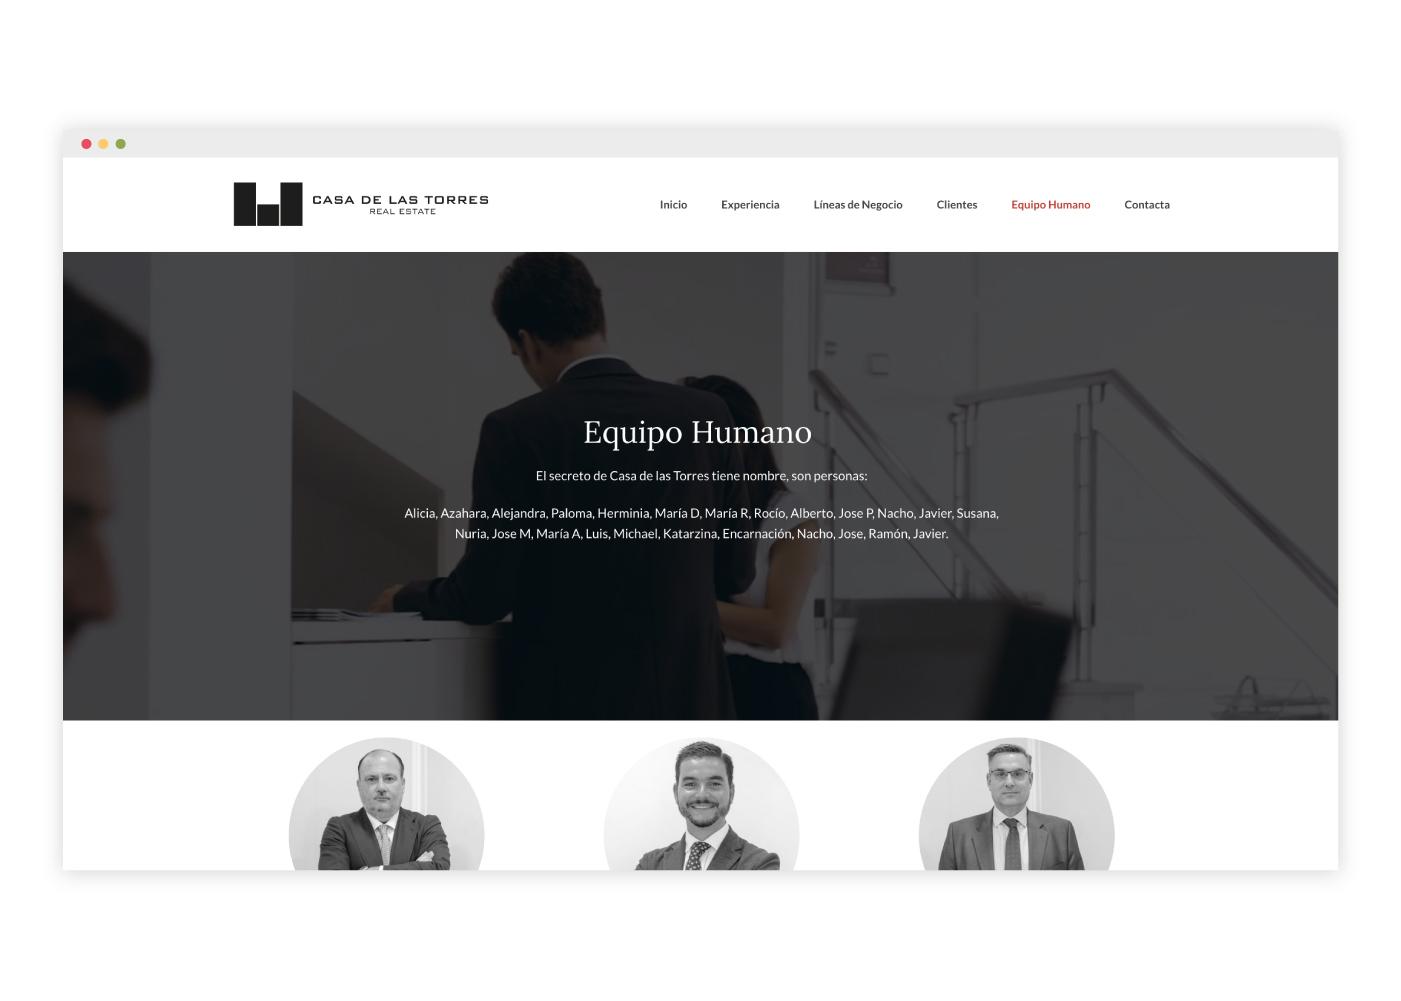 diseno-web-inmobiliaria-madrid-malaga-6